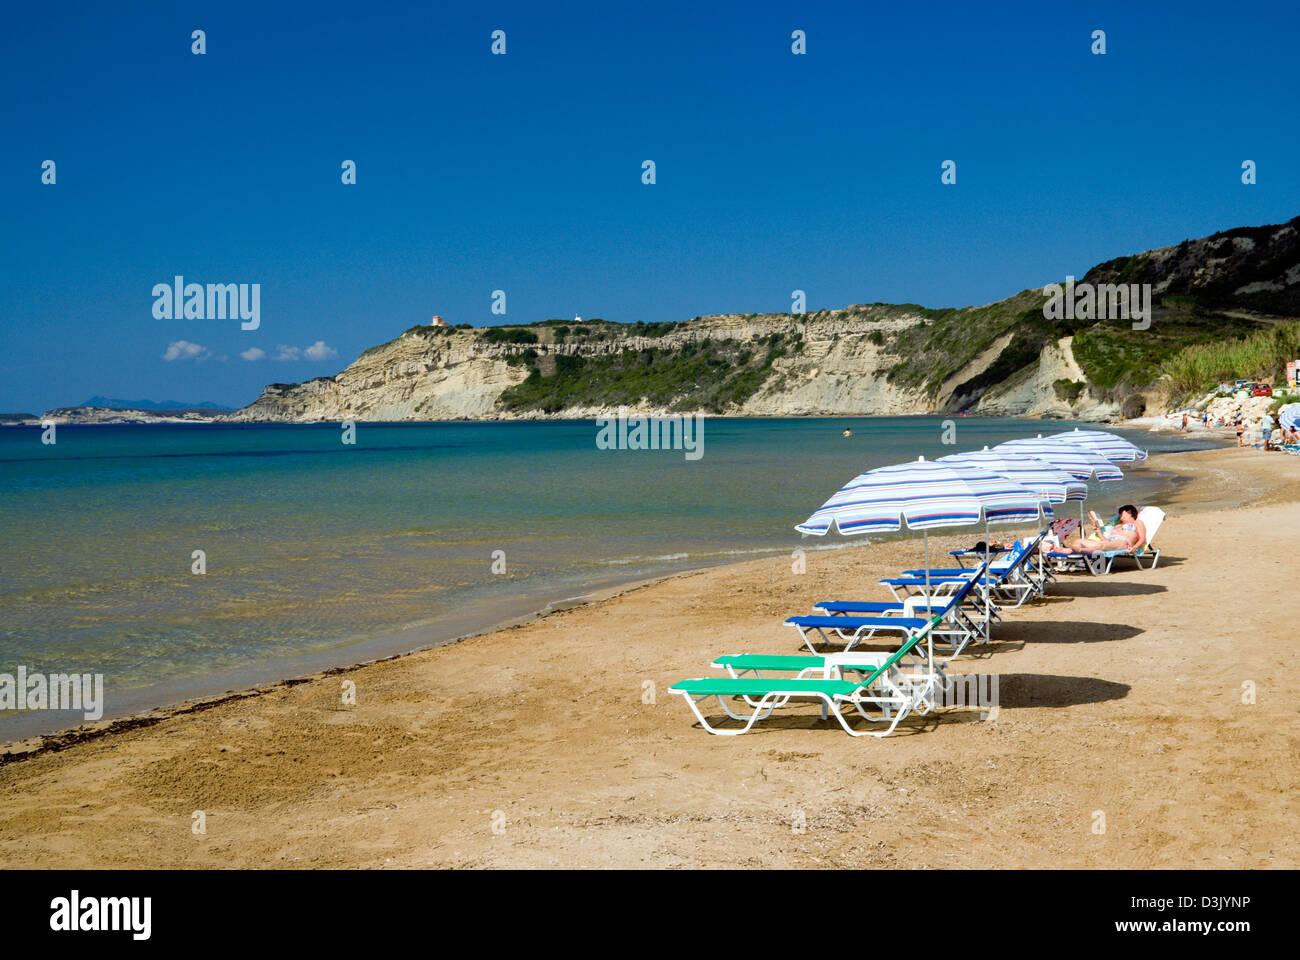 beach, arillas, corfu, ionian islands, greece - Stock Image